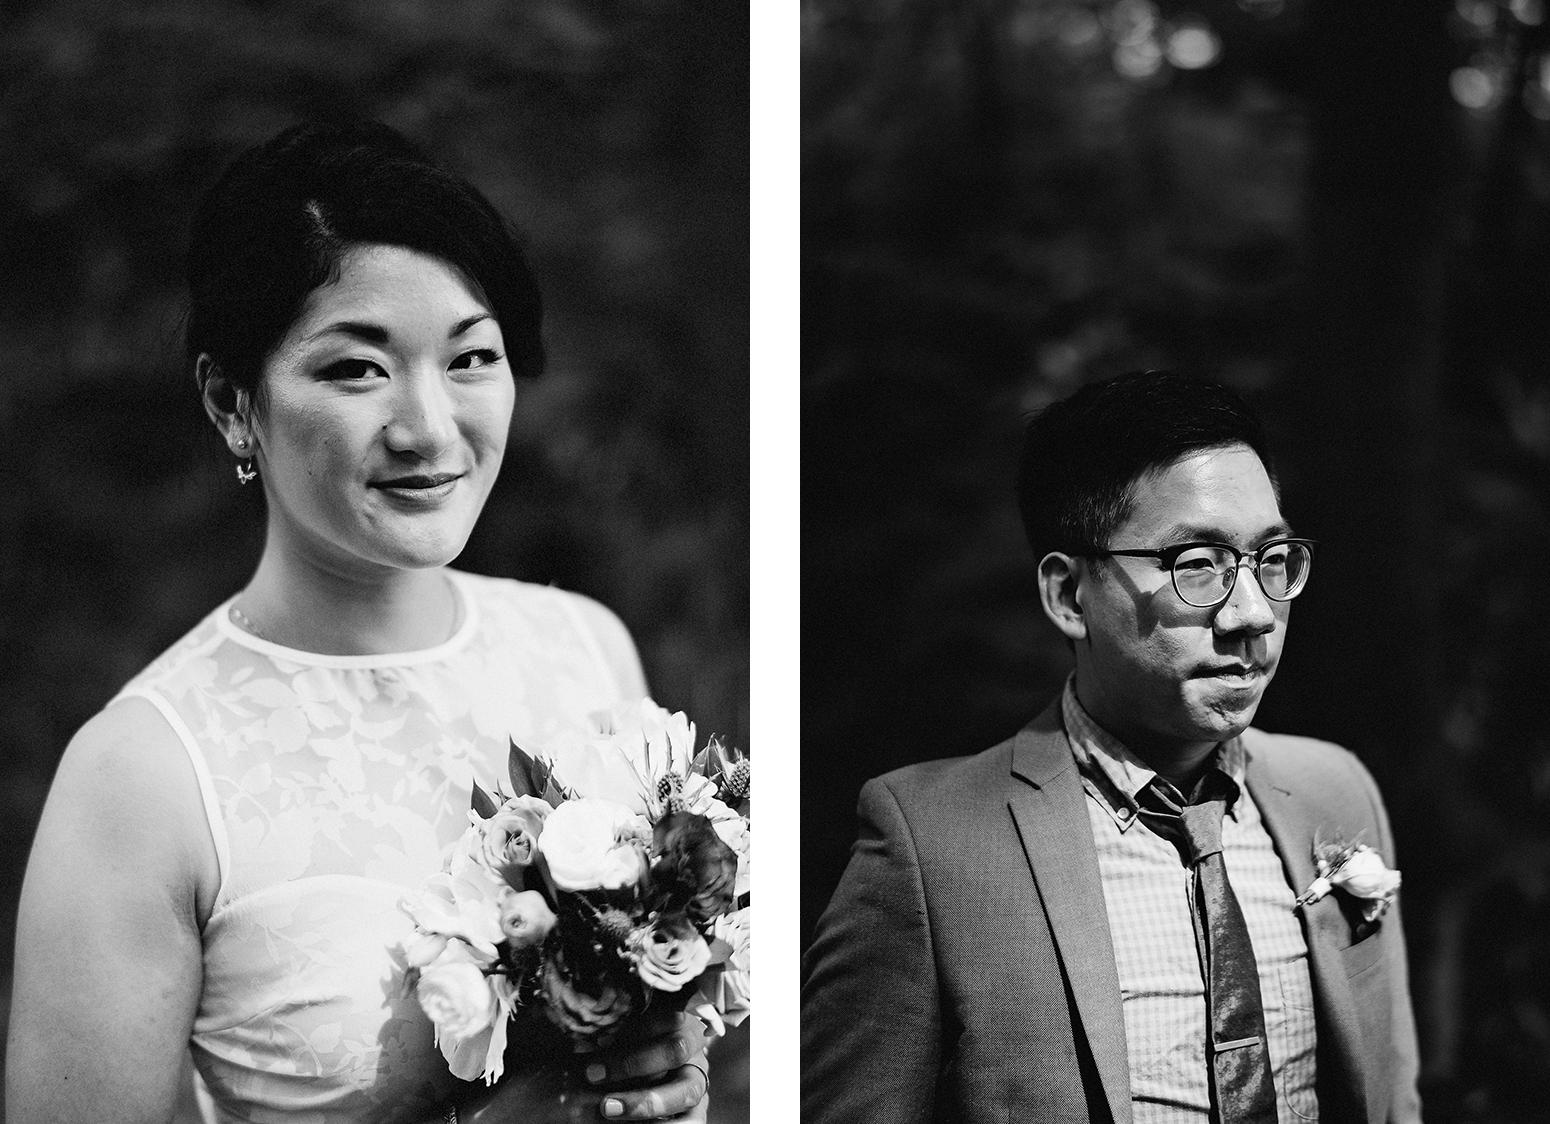 spread-9-Best-Toronto-Wedding-Photographers_High-Park-Wedding_The-Lodge-Wedding_George-Restaurant-Reception_Analog-Film_Intimate-Casual-Outdoor-Forest-Wedding-High-Park-Toronto-Editorial-Fine-Art-Portrait-of-Bride.jpg